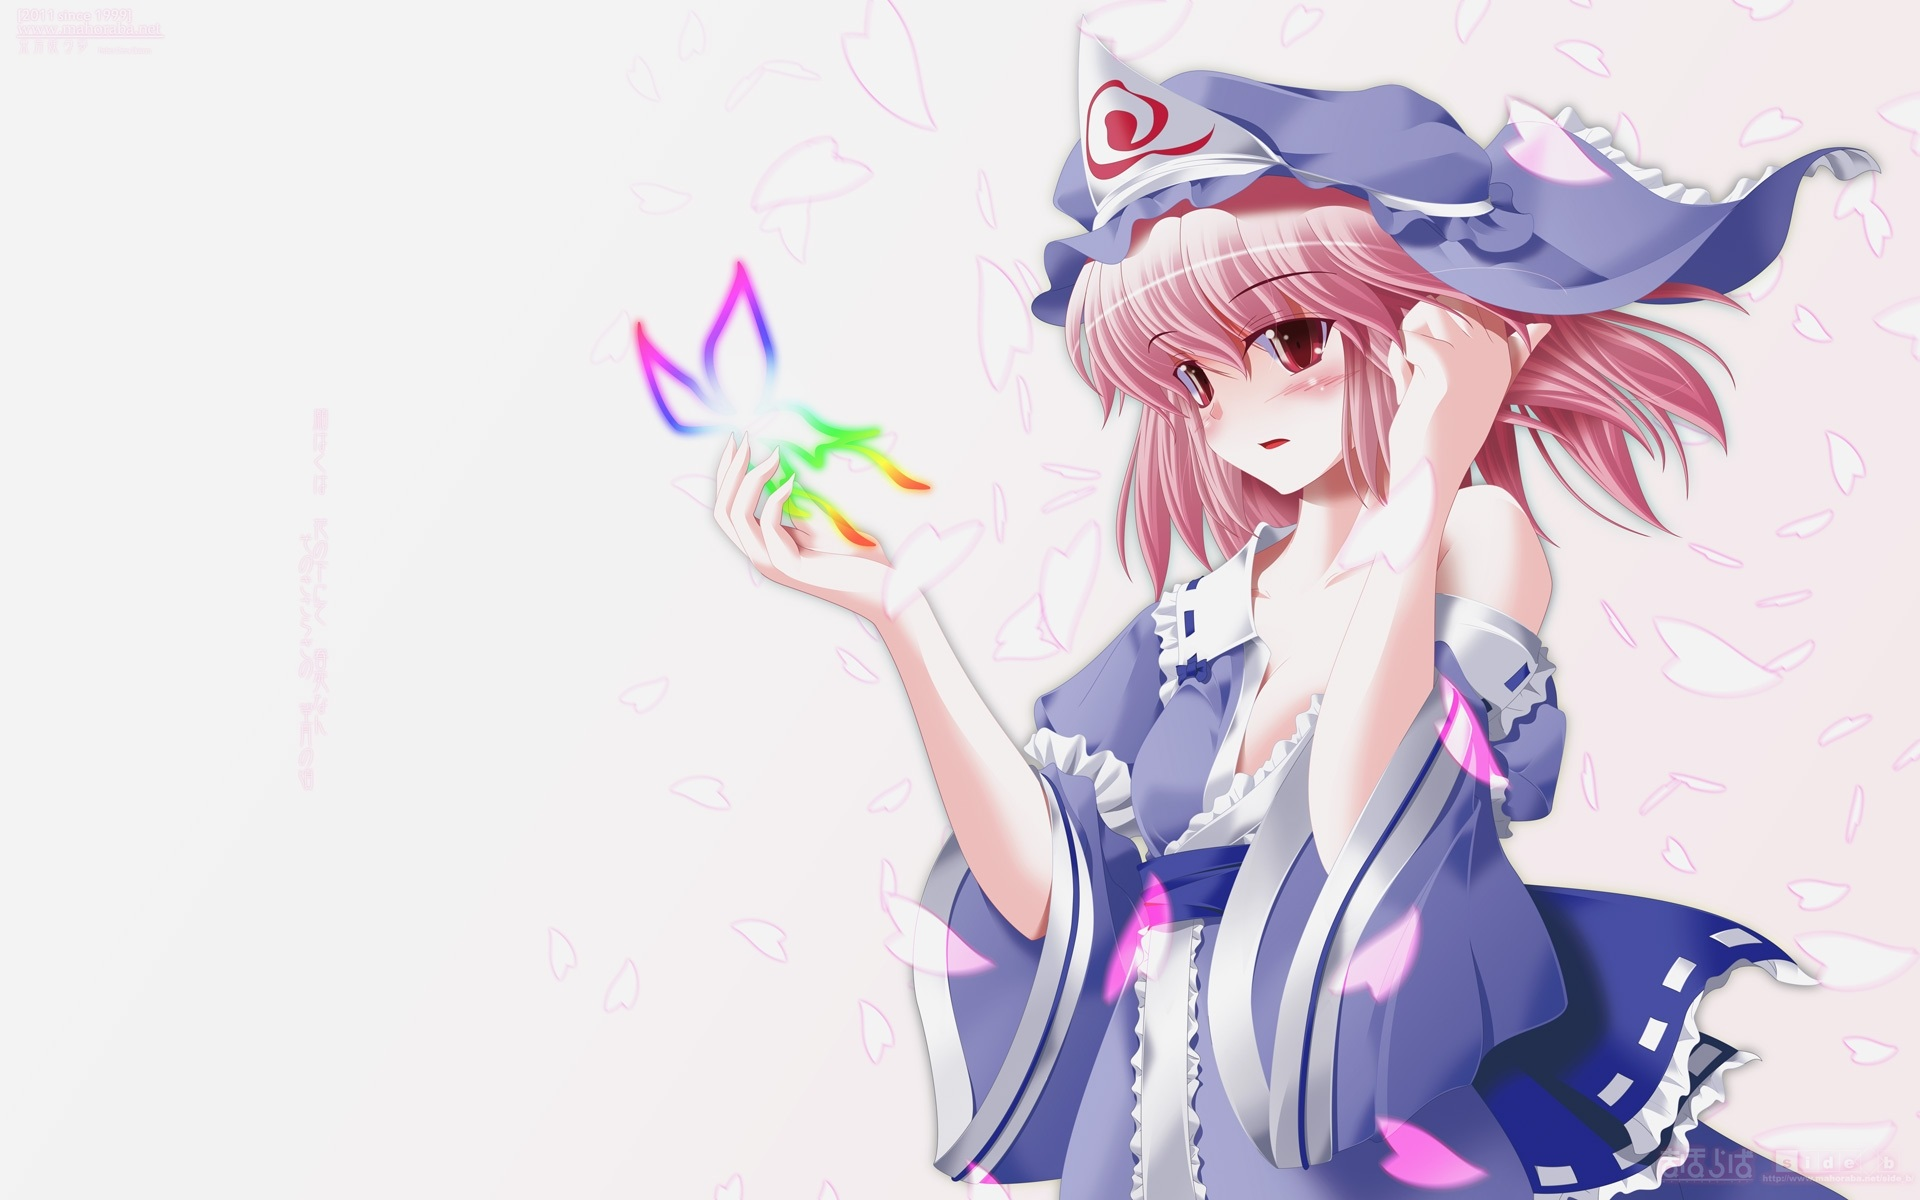 Wallpaper Lovely Pink Hair Anime Girl Butterfly 1920x1200 HD